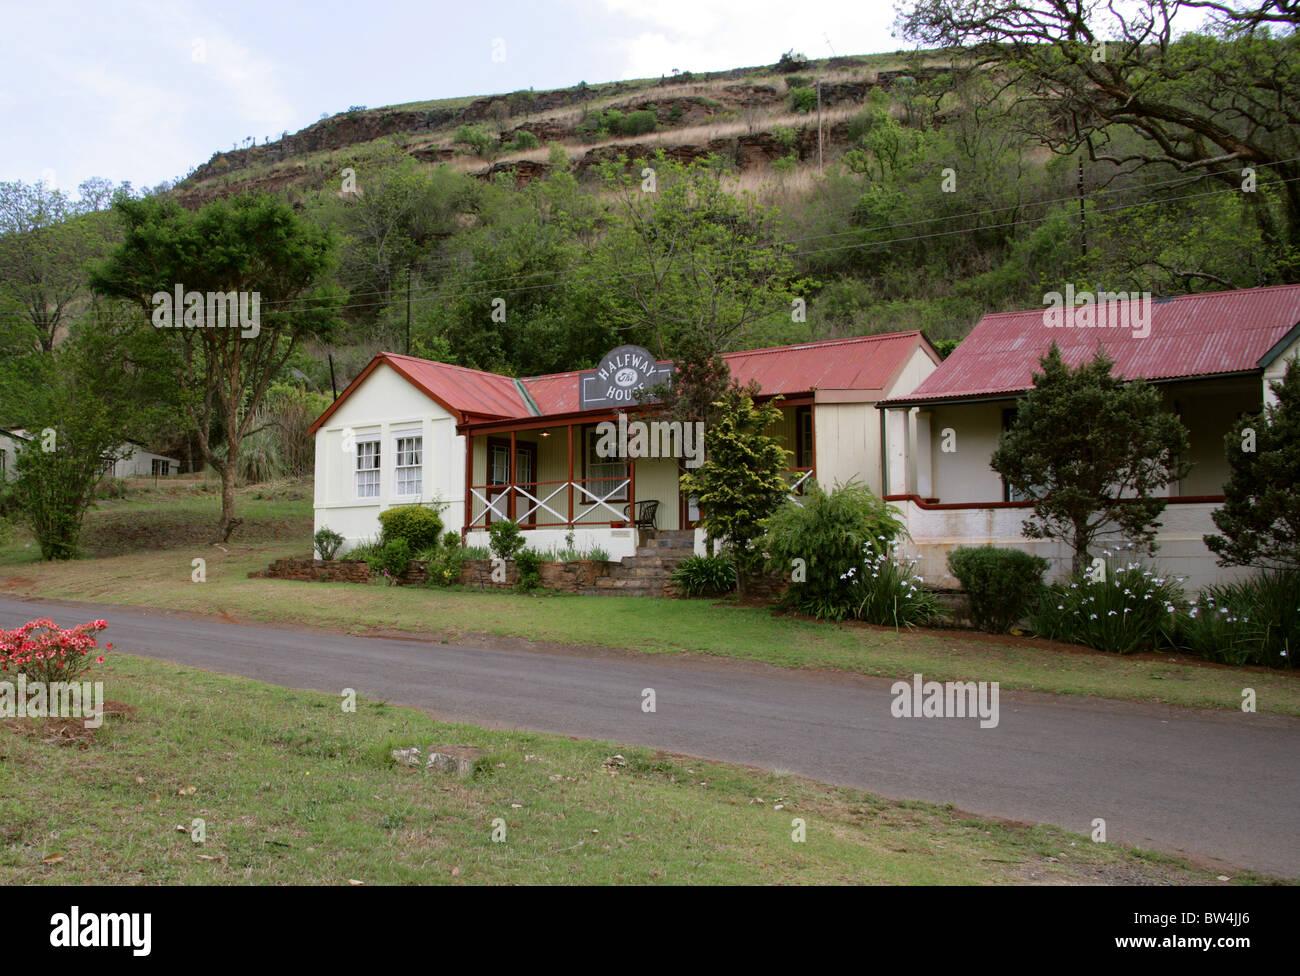 The Halfway House, Pilgrim's Rest, Mpumalanga, South Africa - Stock Image